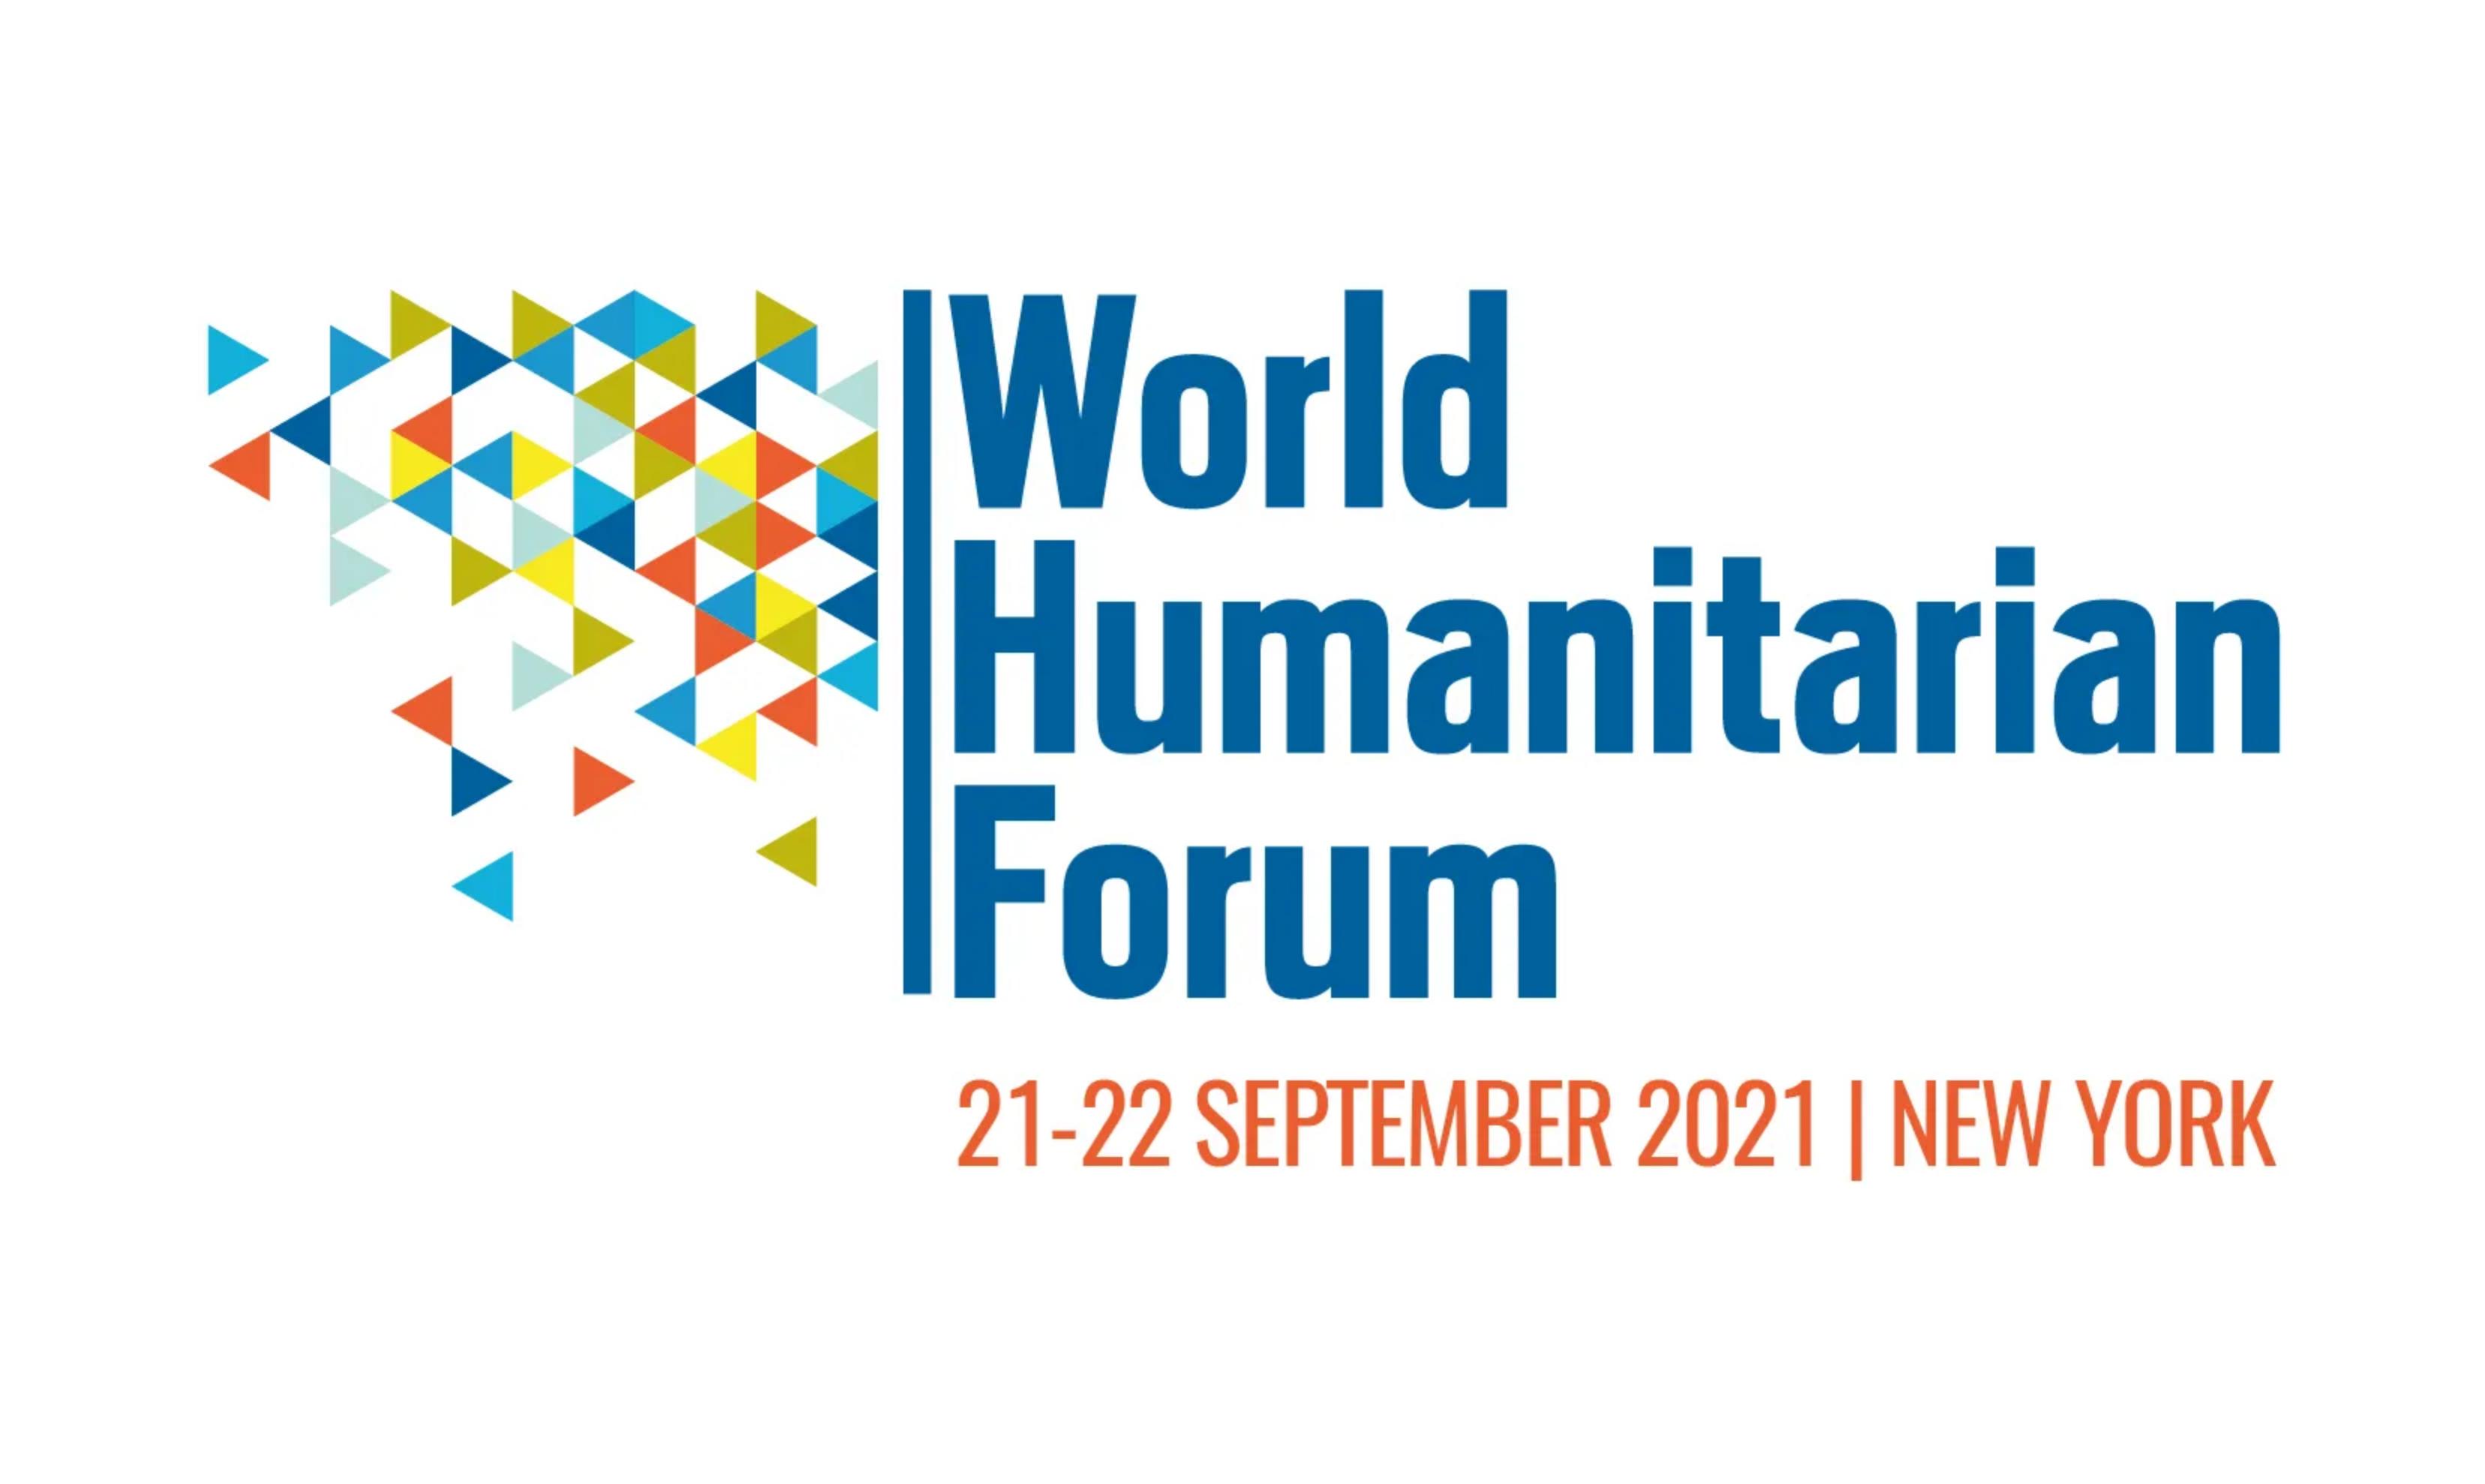 Global Director Brighton Kaoma to speak at the World Humanitarian Forum 2021